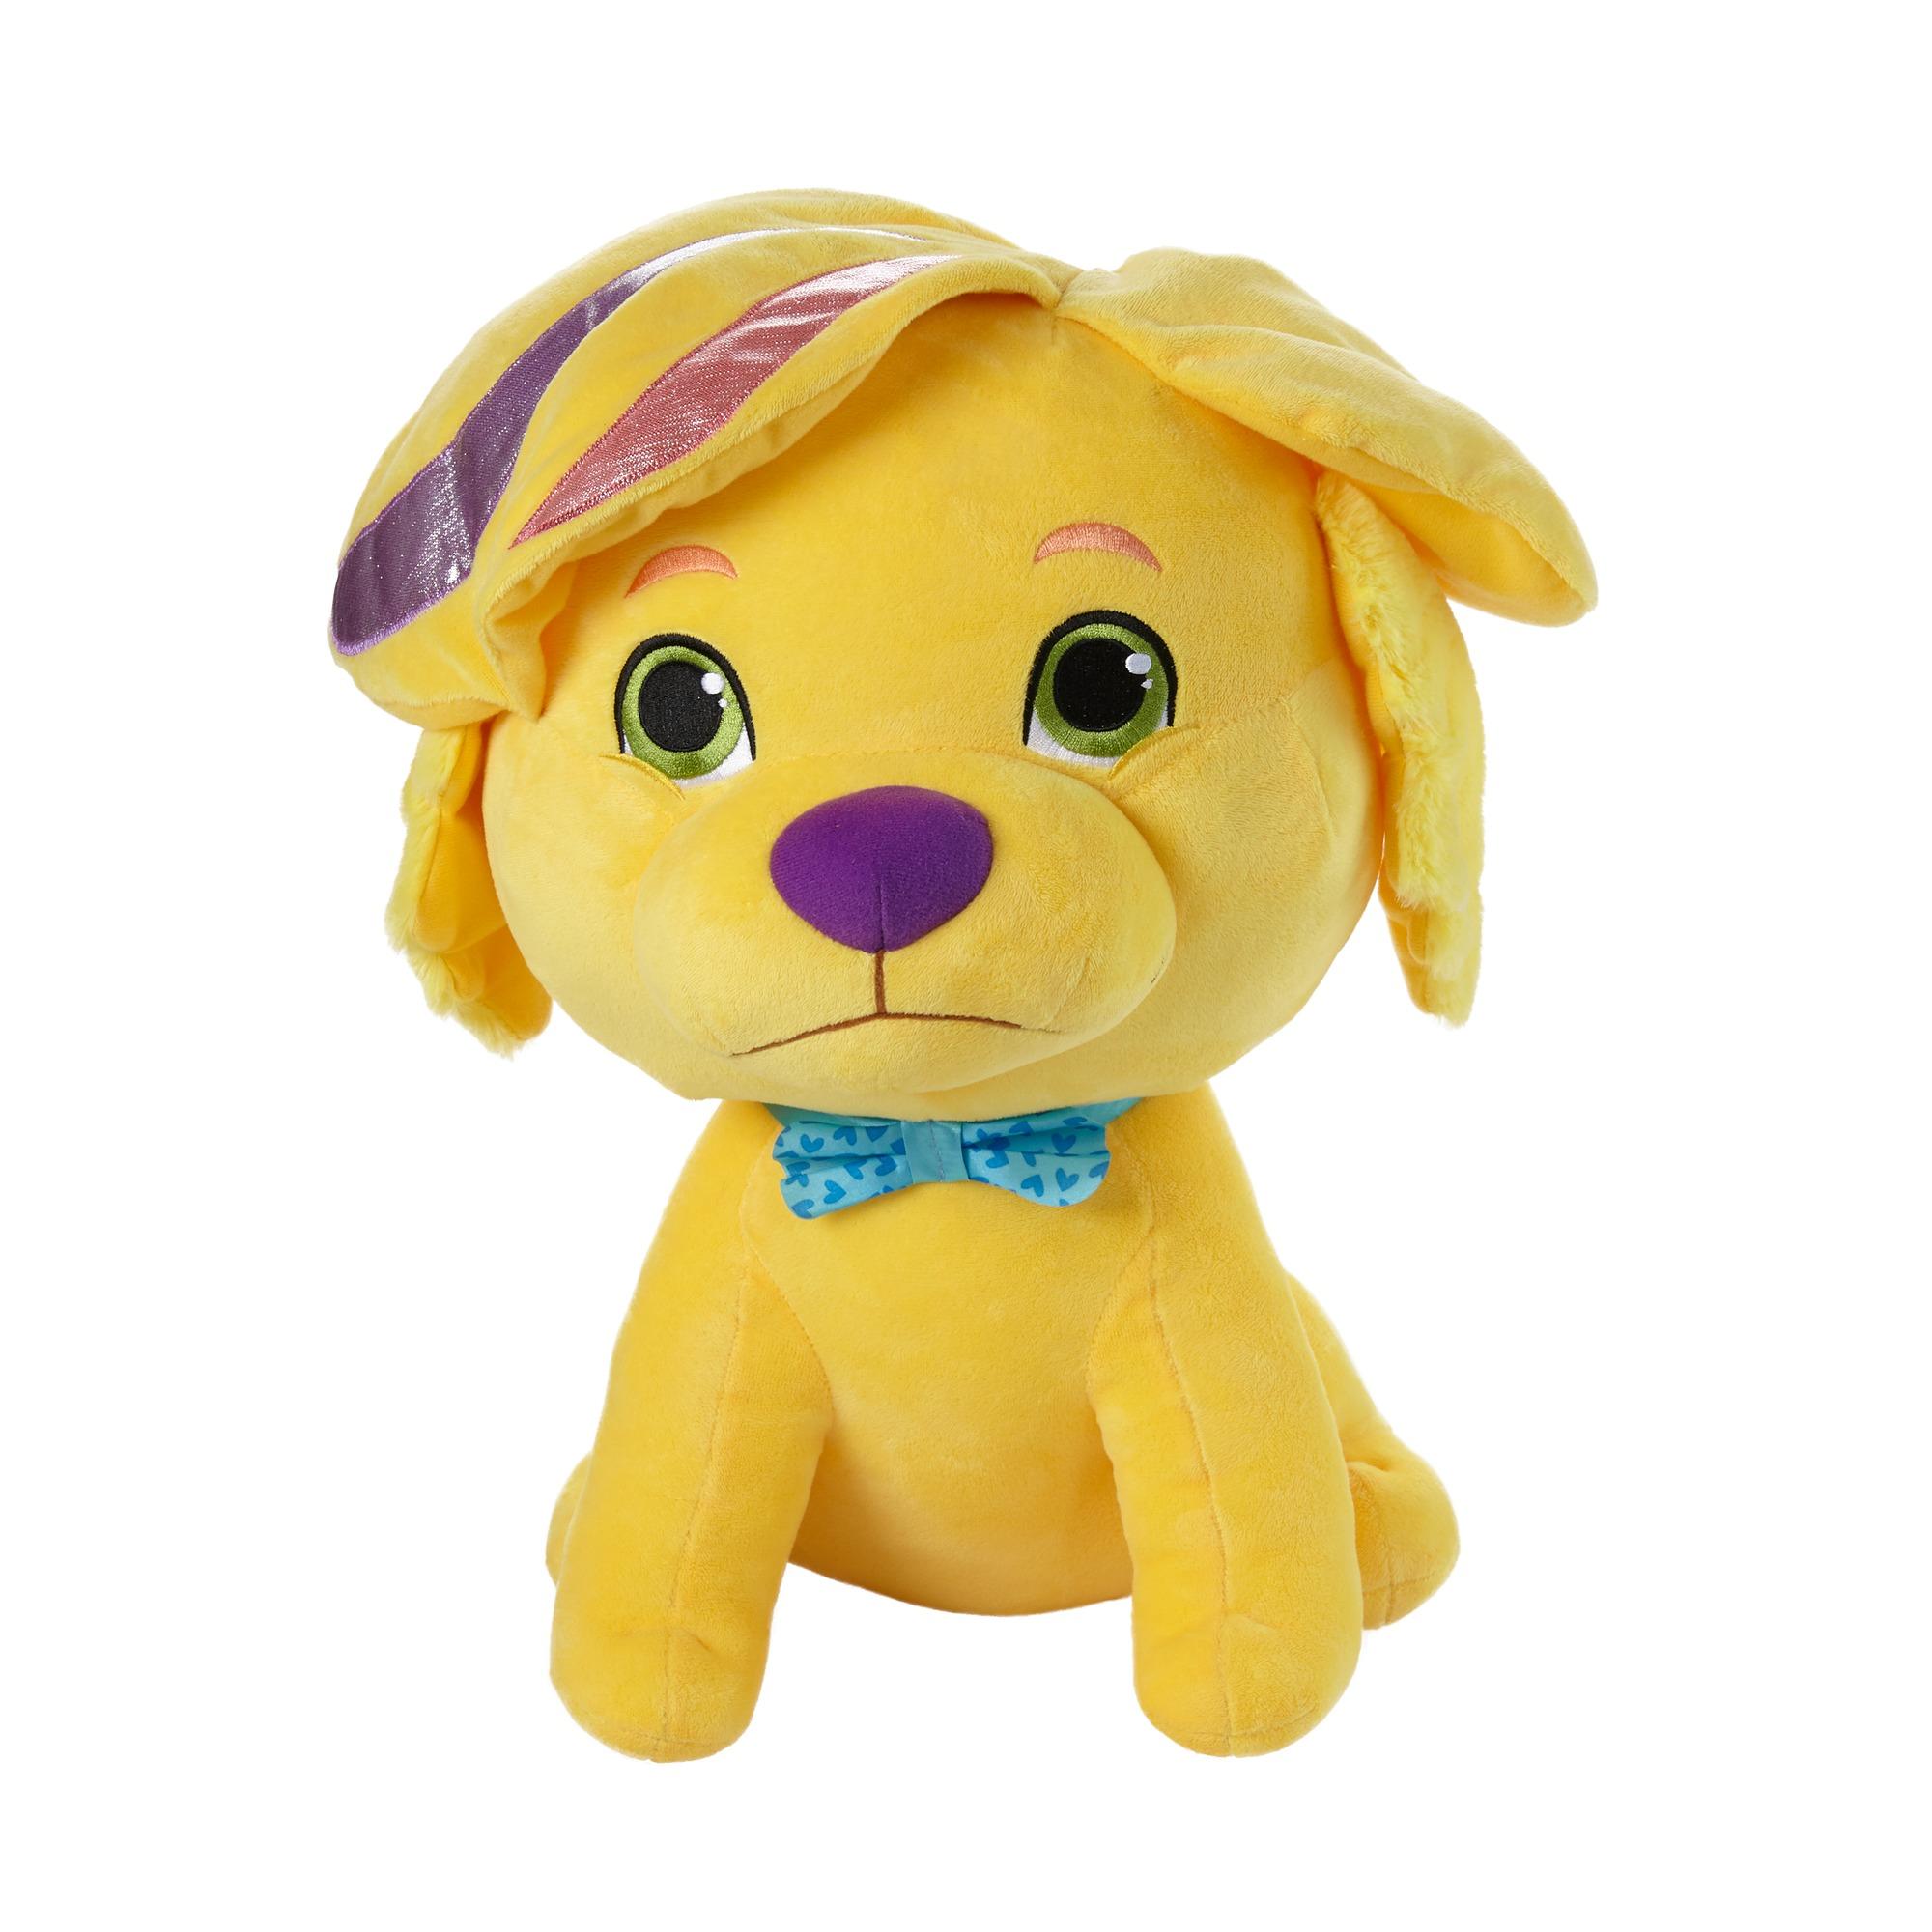 Nickelodeon Sunny Day Plush Jumbo Doodle Best Dog Friend Forever